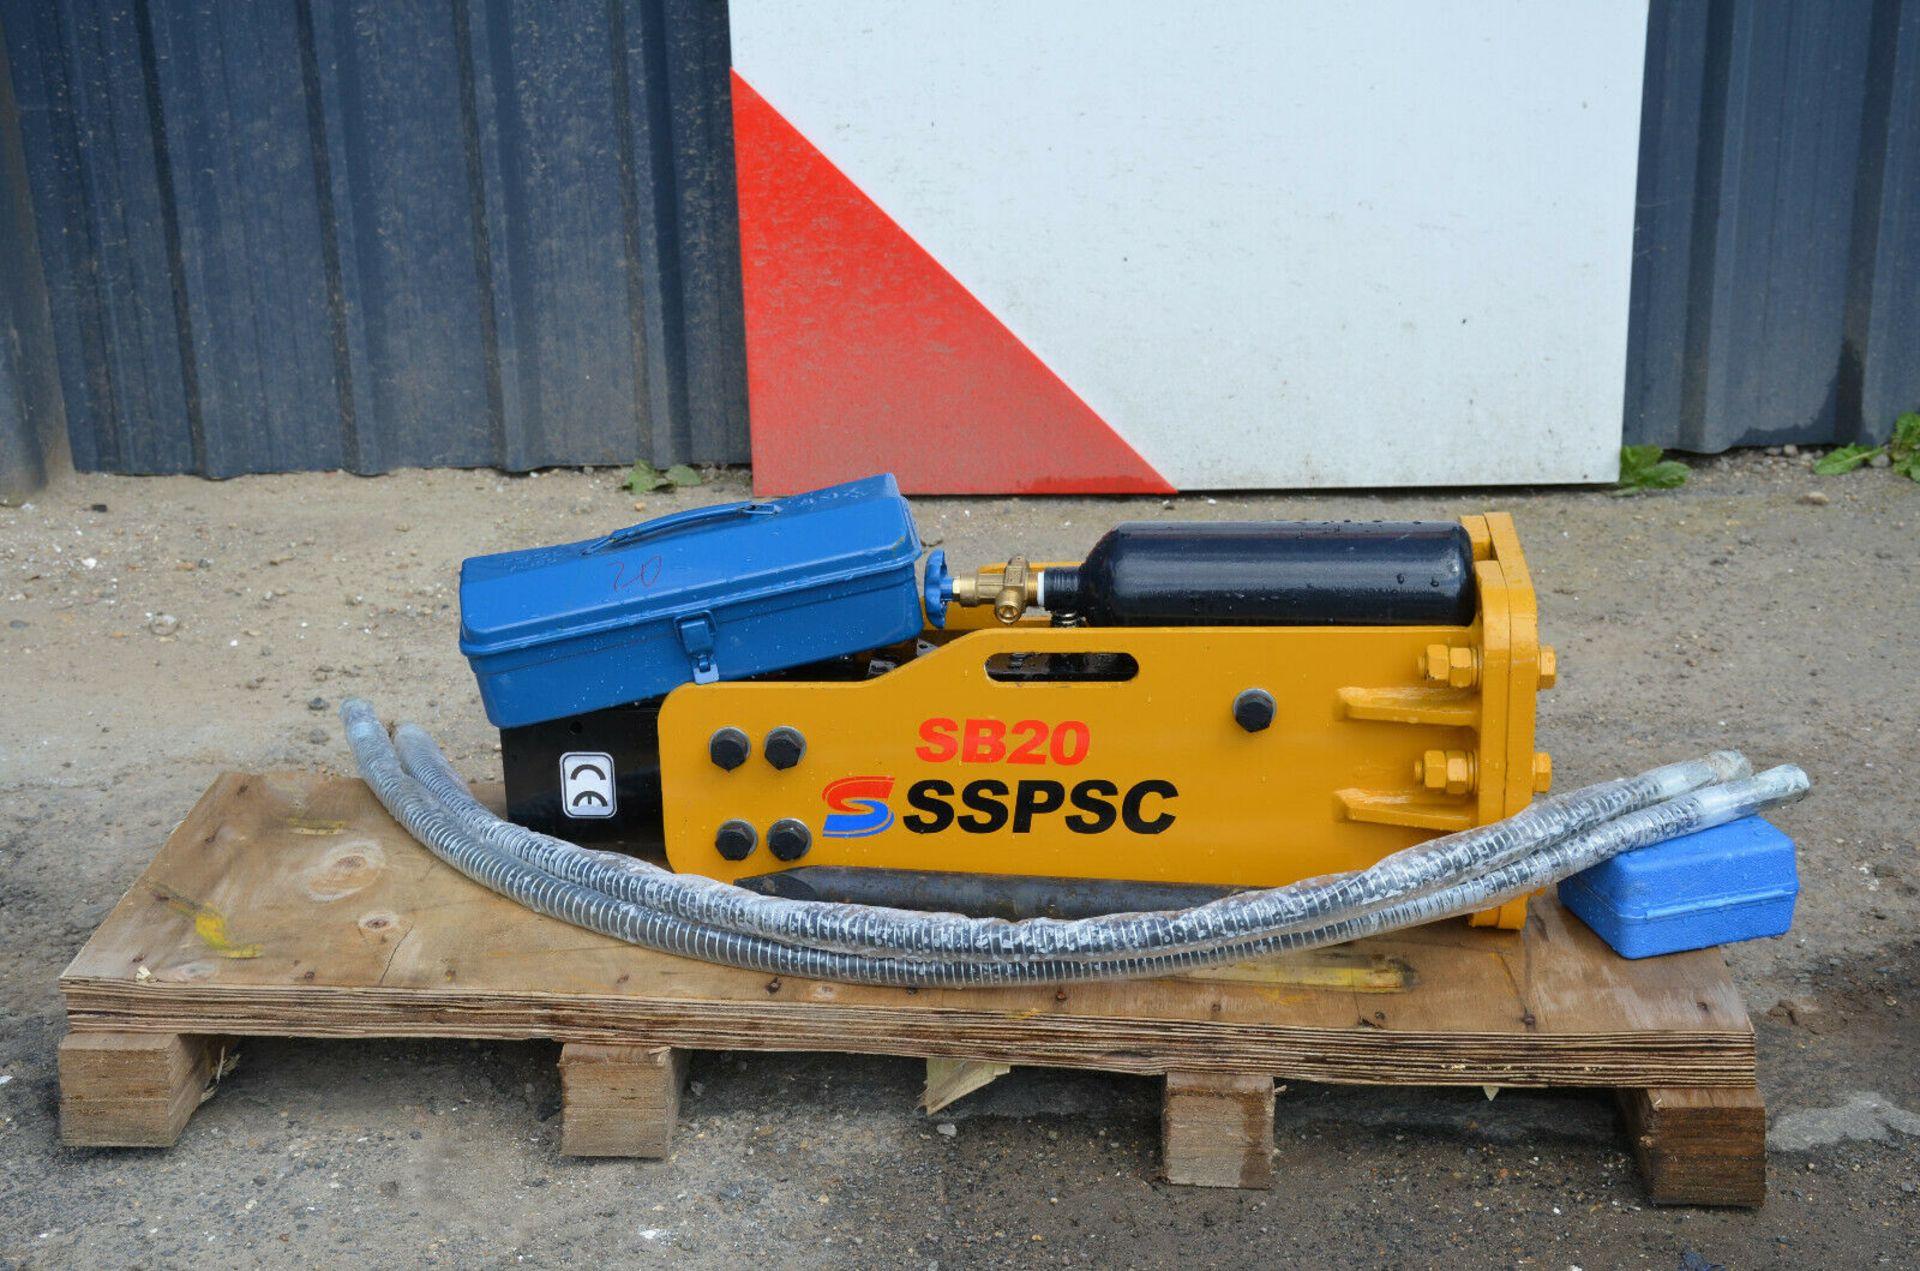 SSPSC SB20 Hydraulic Breaker